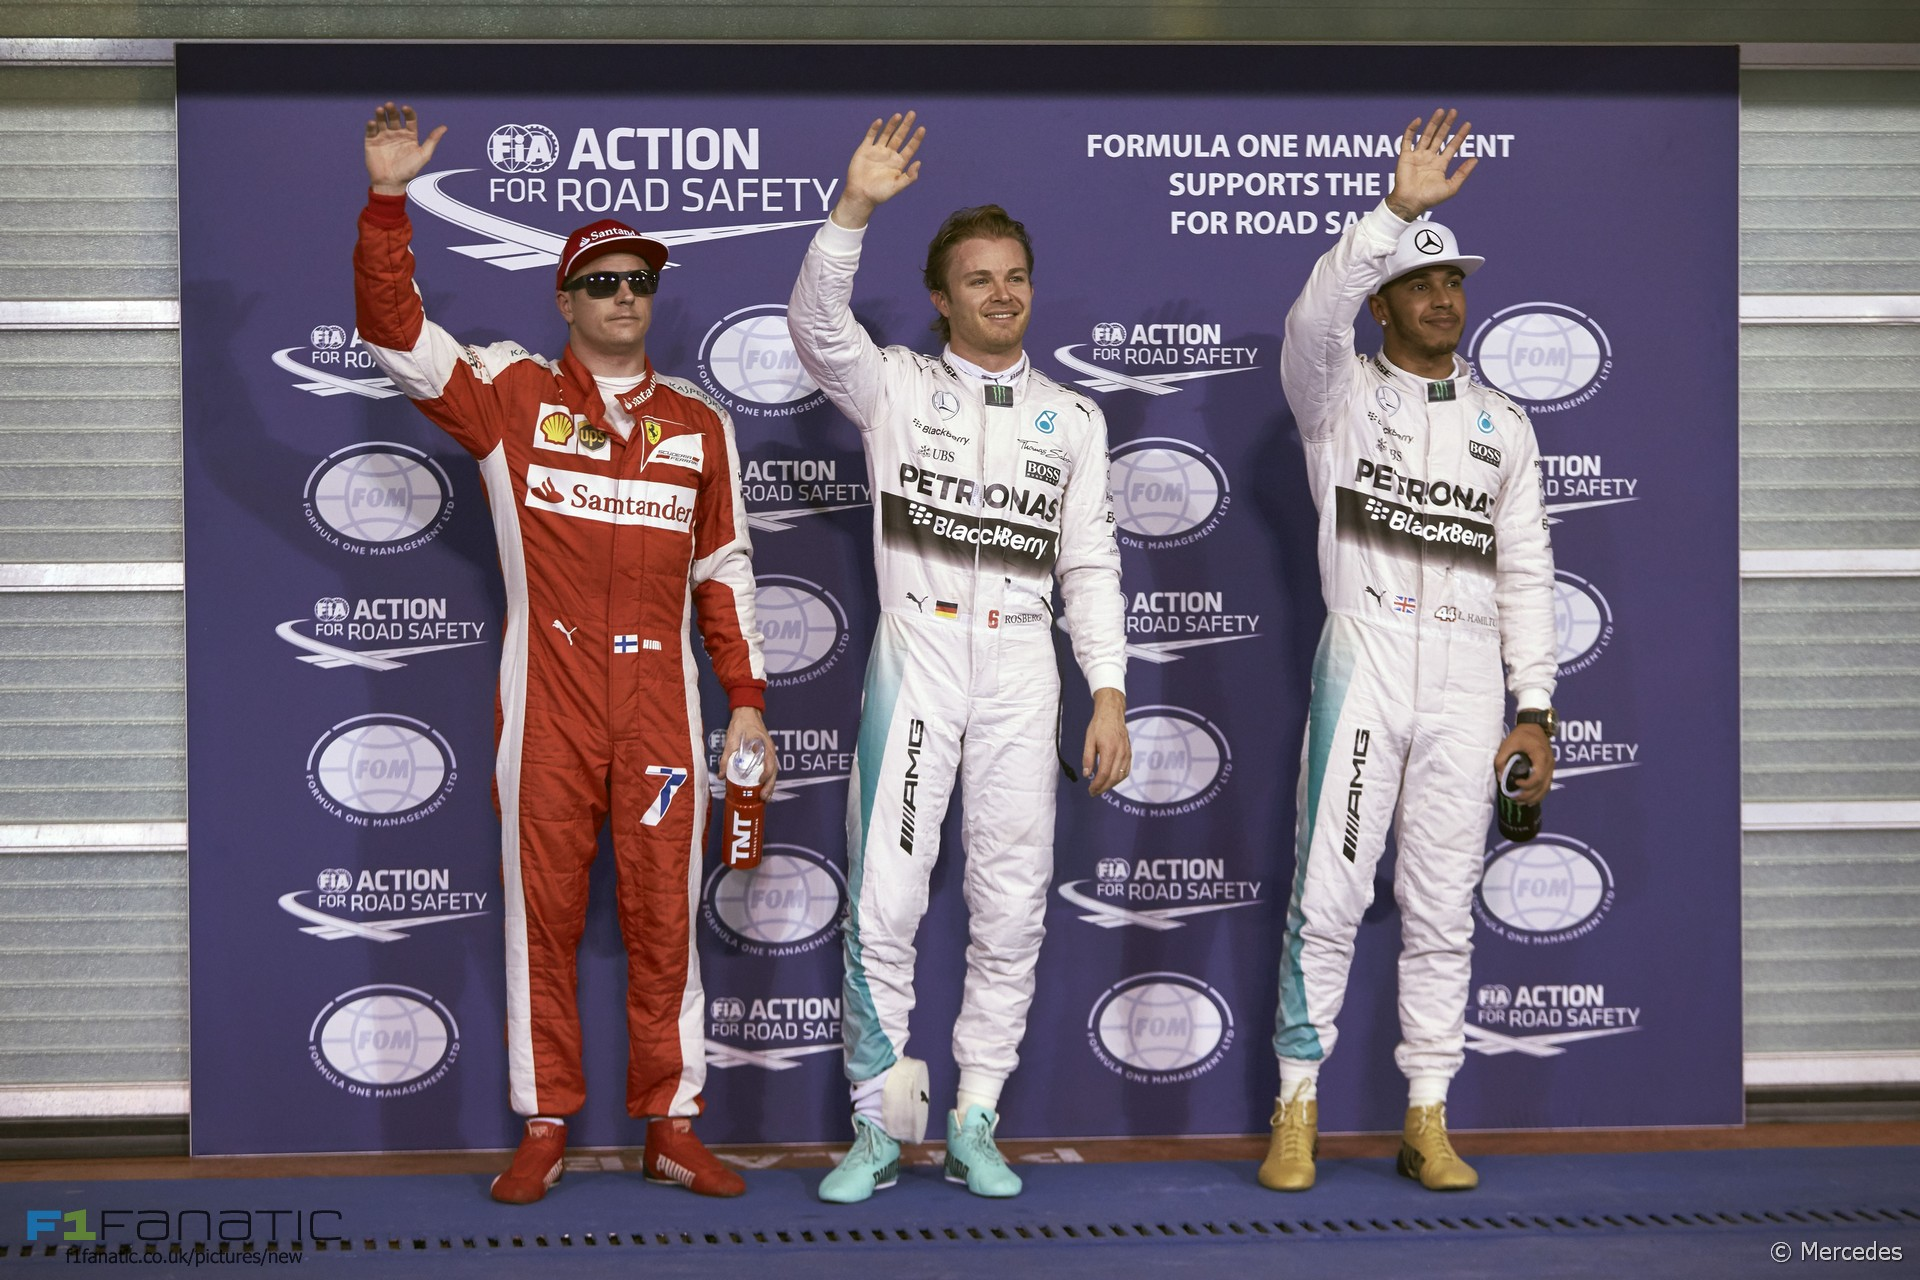 Kimi Raikkonen, Nico Rosberg, Lewis Hamilton, Yas Marina, 2015